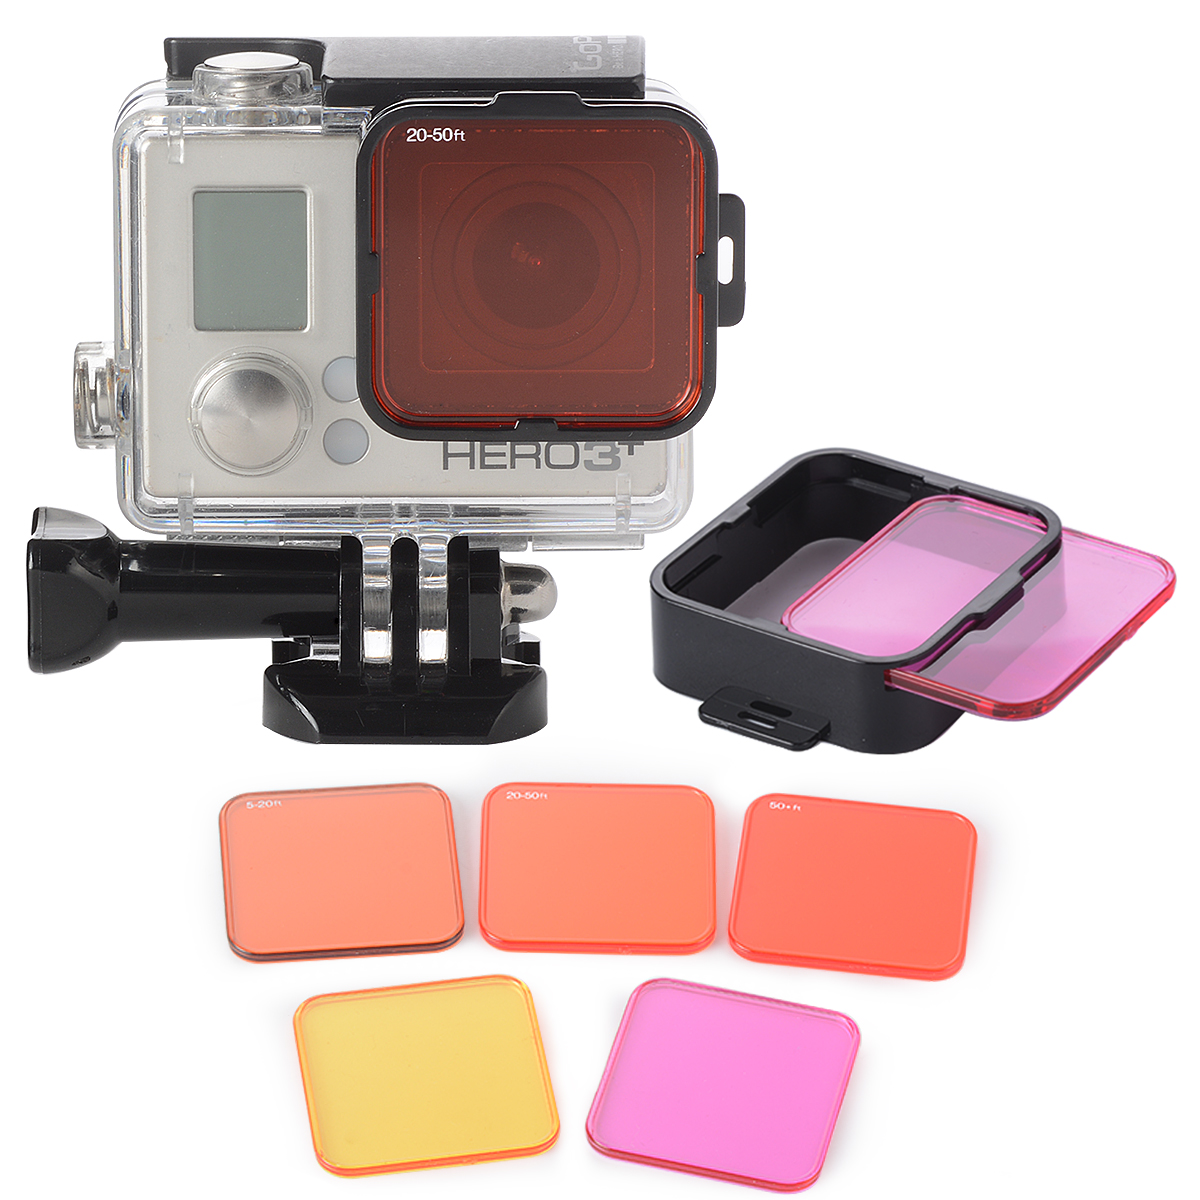 5pcs Diving Waterproof Polarizer Filter Lens Kits Red+ Purple+ Yellow+ Filter Mounting Frame for Gopro Hero 4 3+ LF722+(China (Mainland))